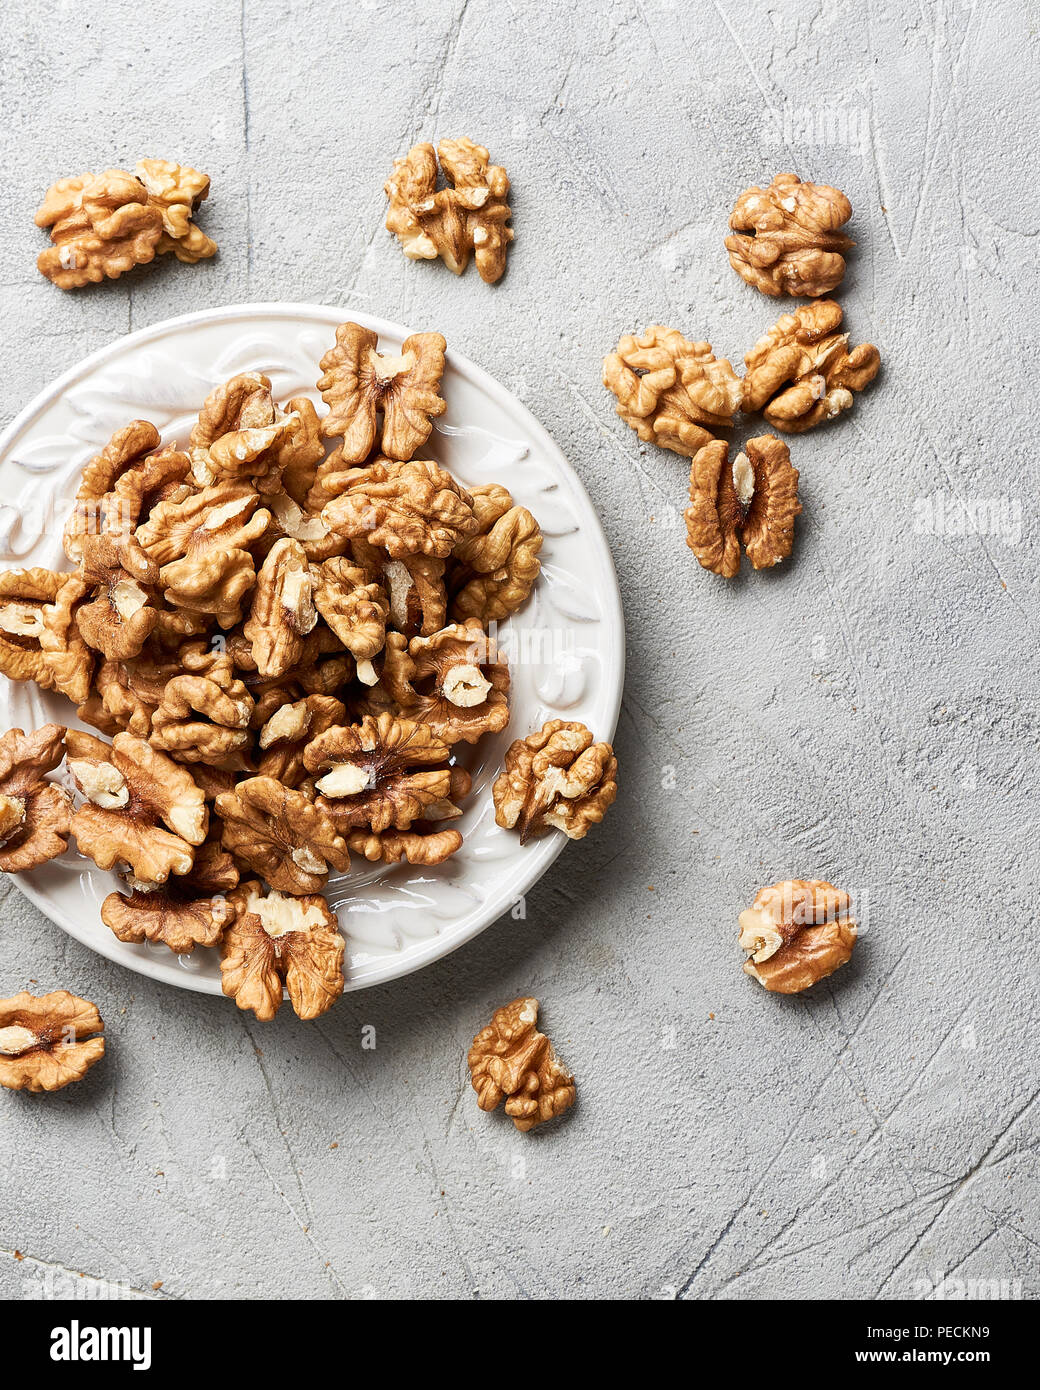 Walnut kernels on white plate over gray background. - Stock Image